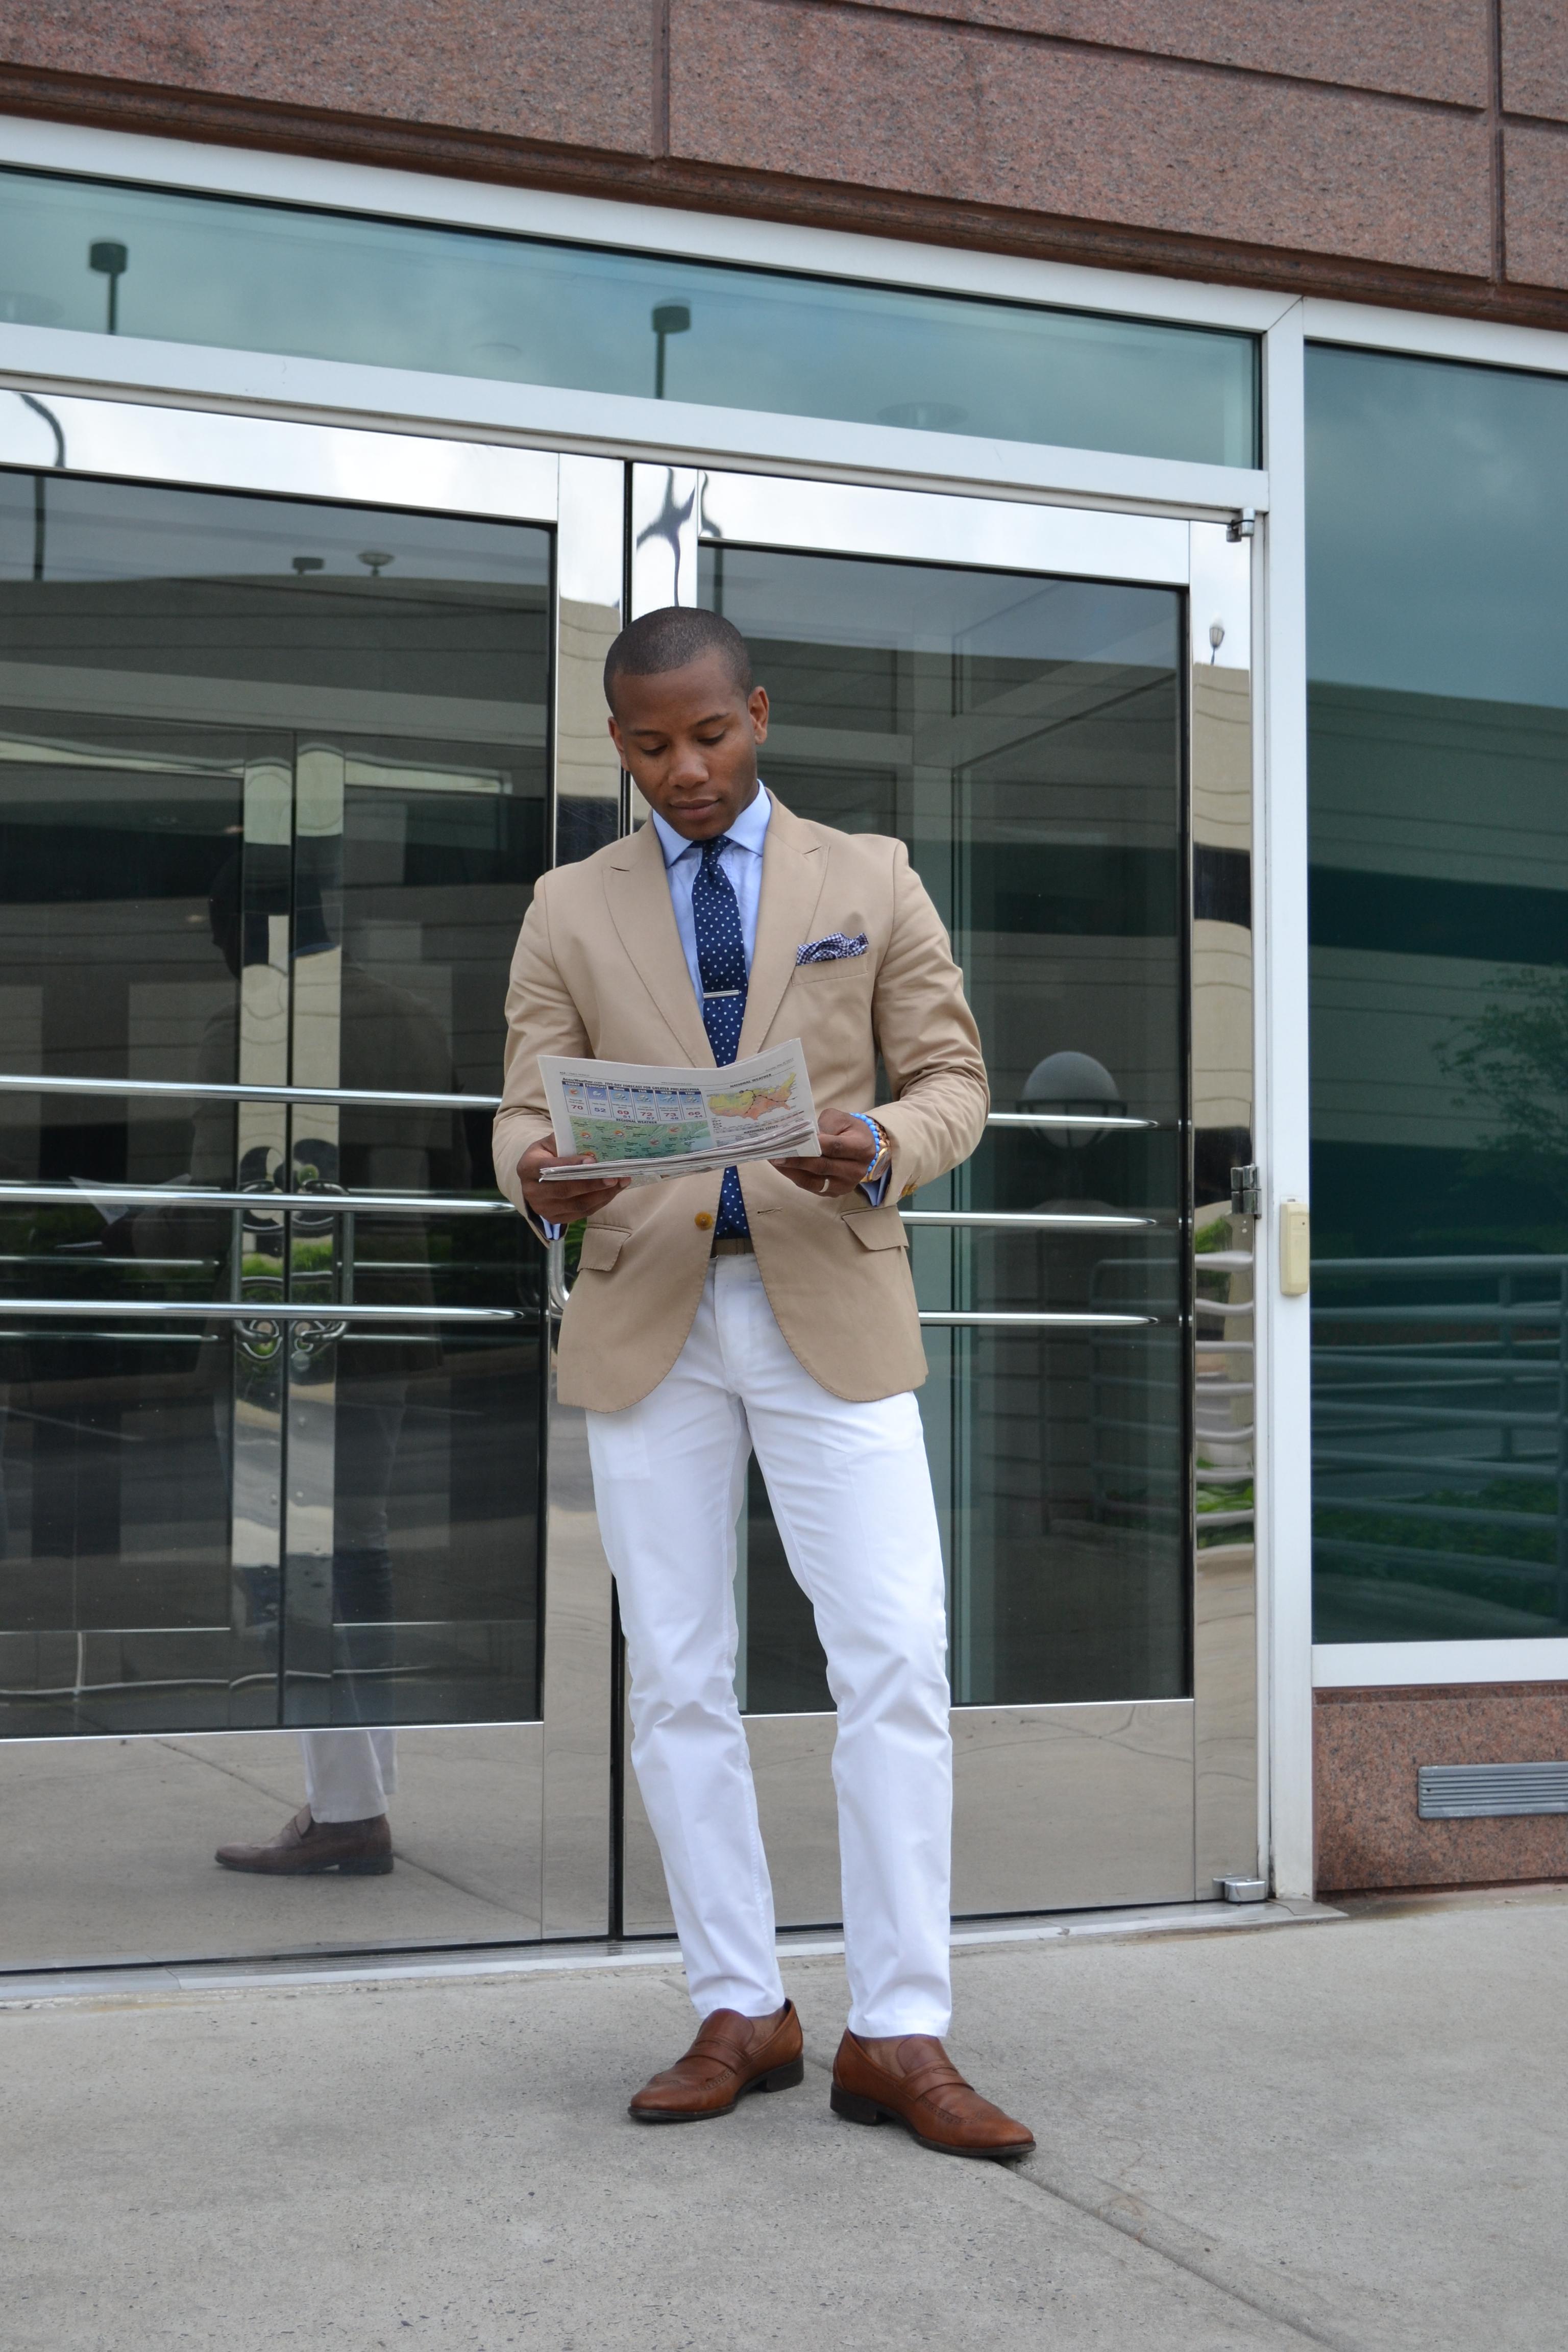 White Khaki Pants For Men - White Pants 2016